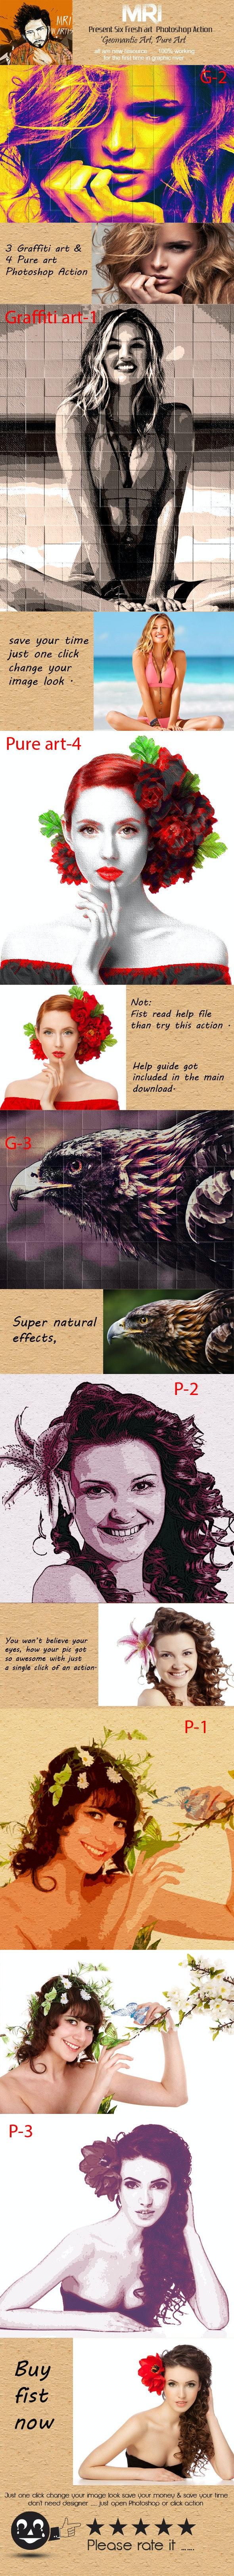 Pure & Graffiti Art - Actions Photoshop